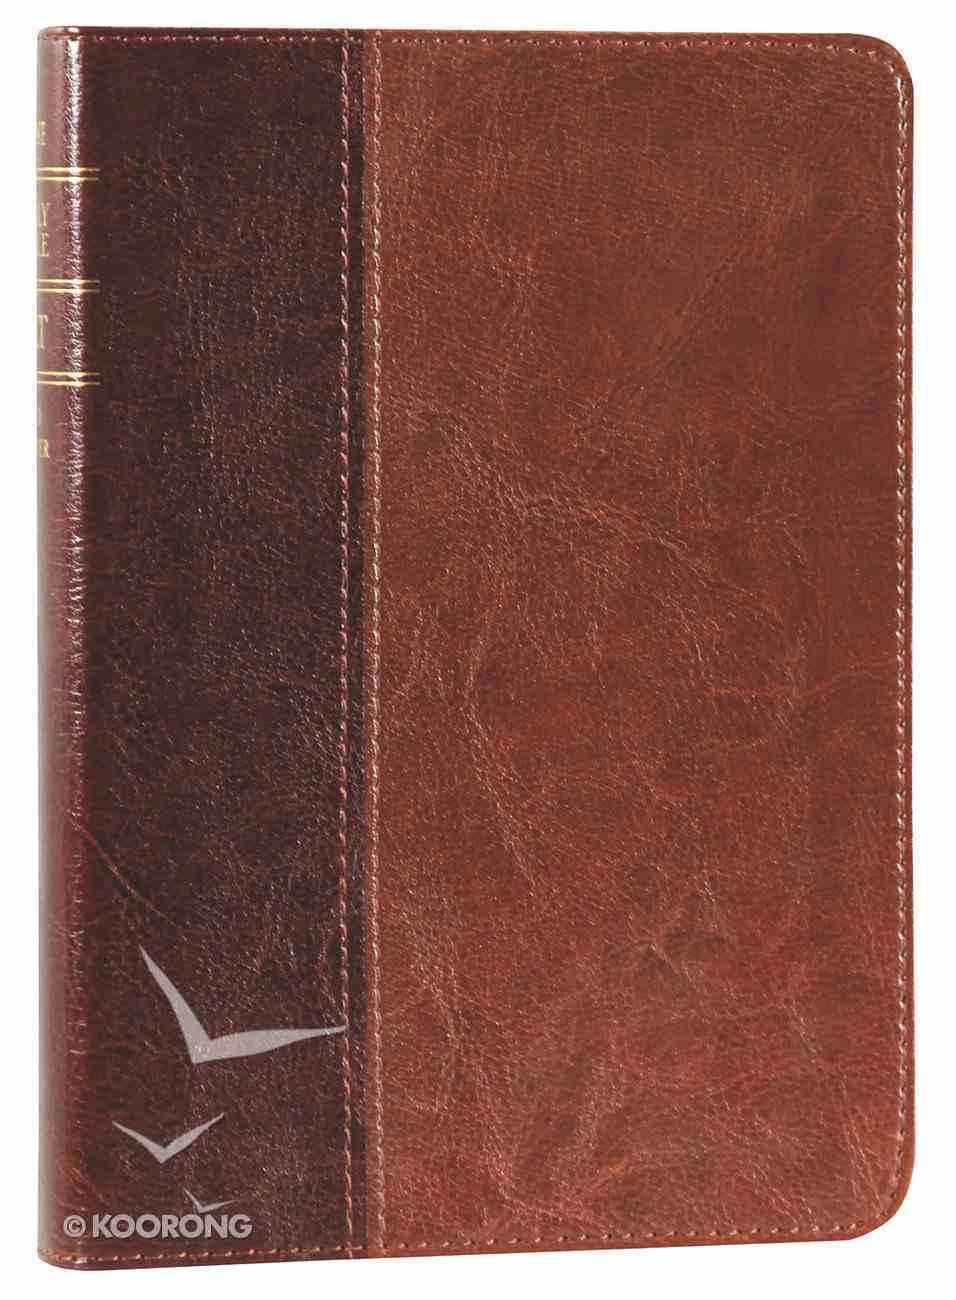 NLT Slimline Center Column Reference Large Print Compact Brown/Tan Tu Tone Imitation Leather